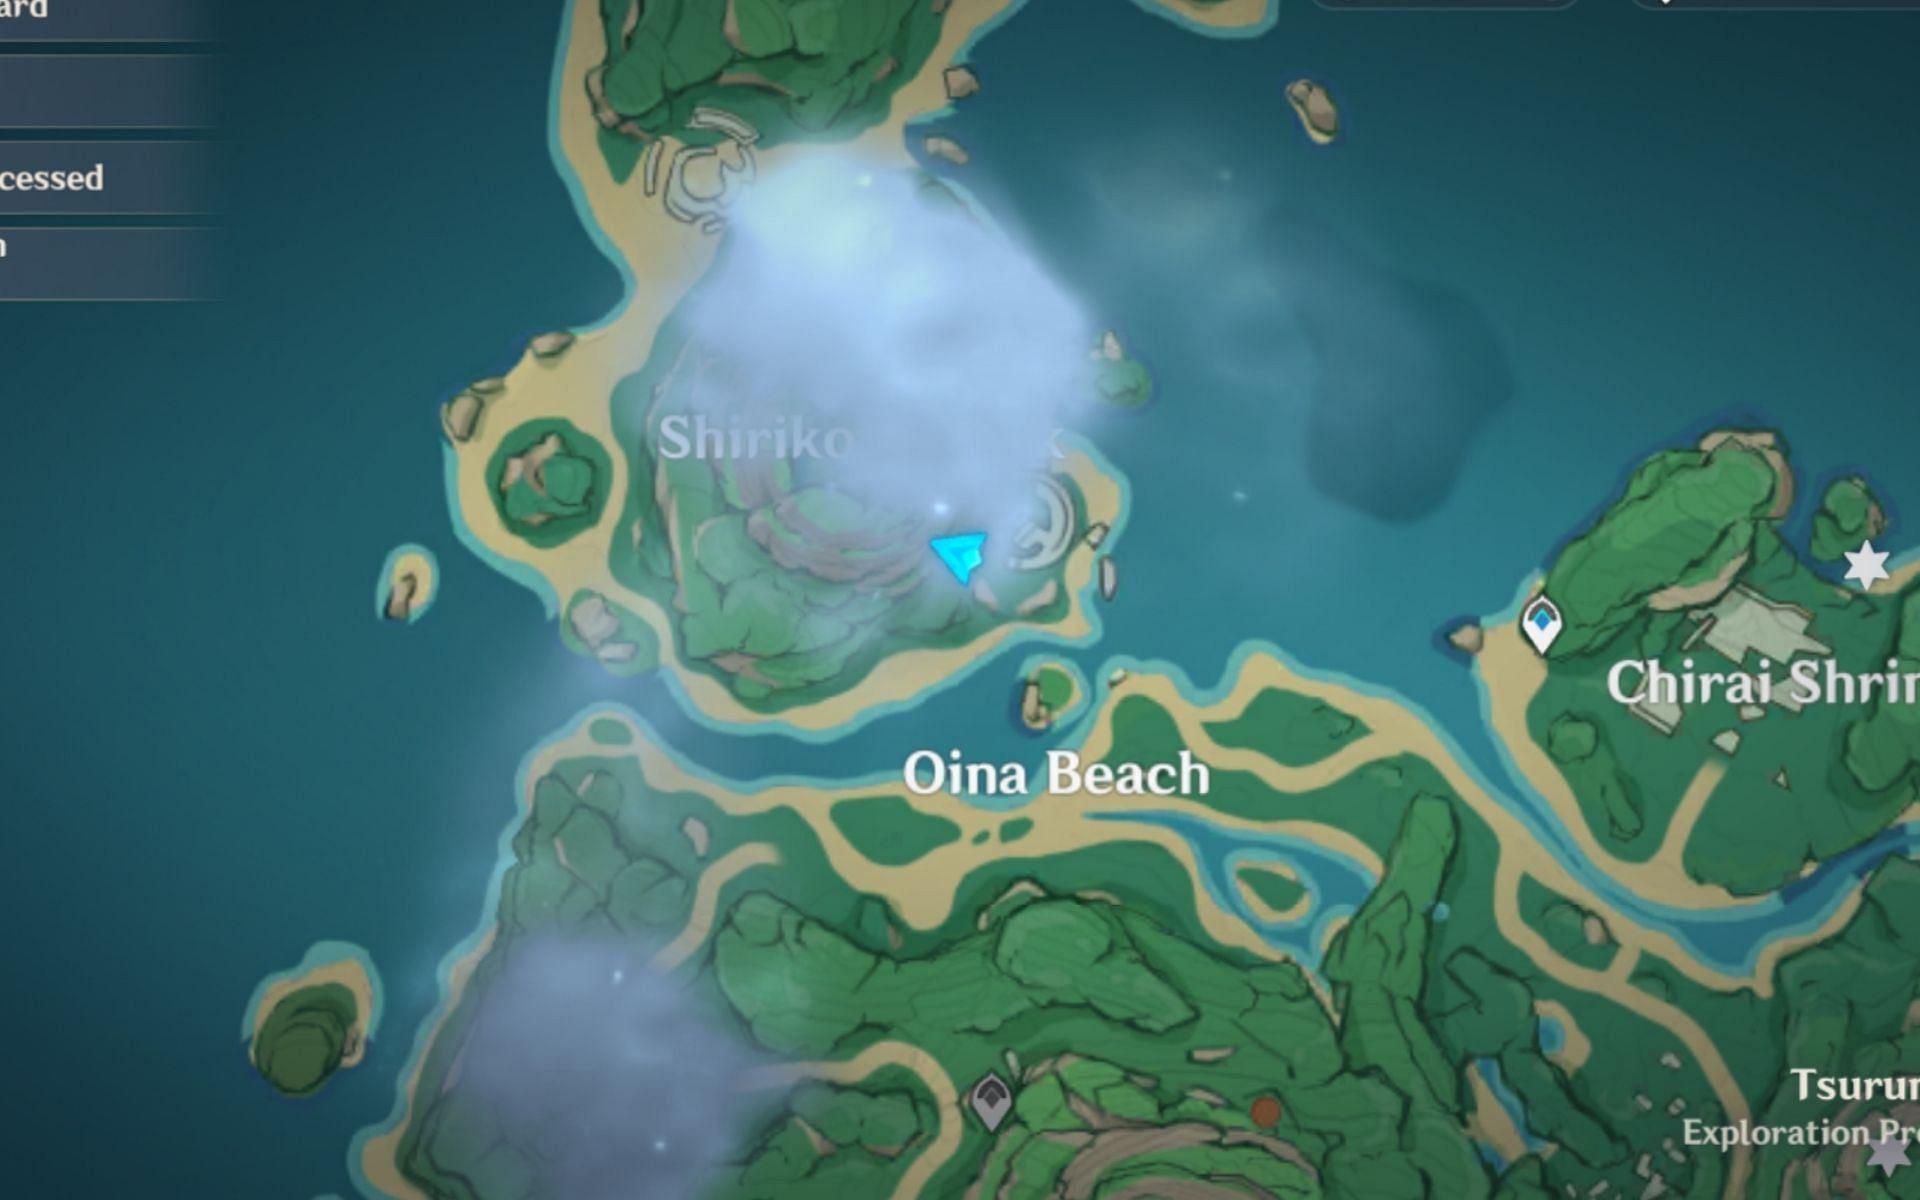 Shirikoro Peak location on the map (Image via Genshin Impact)